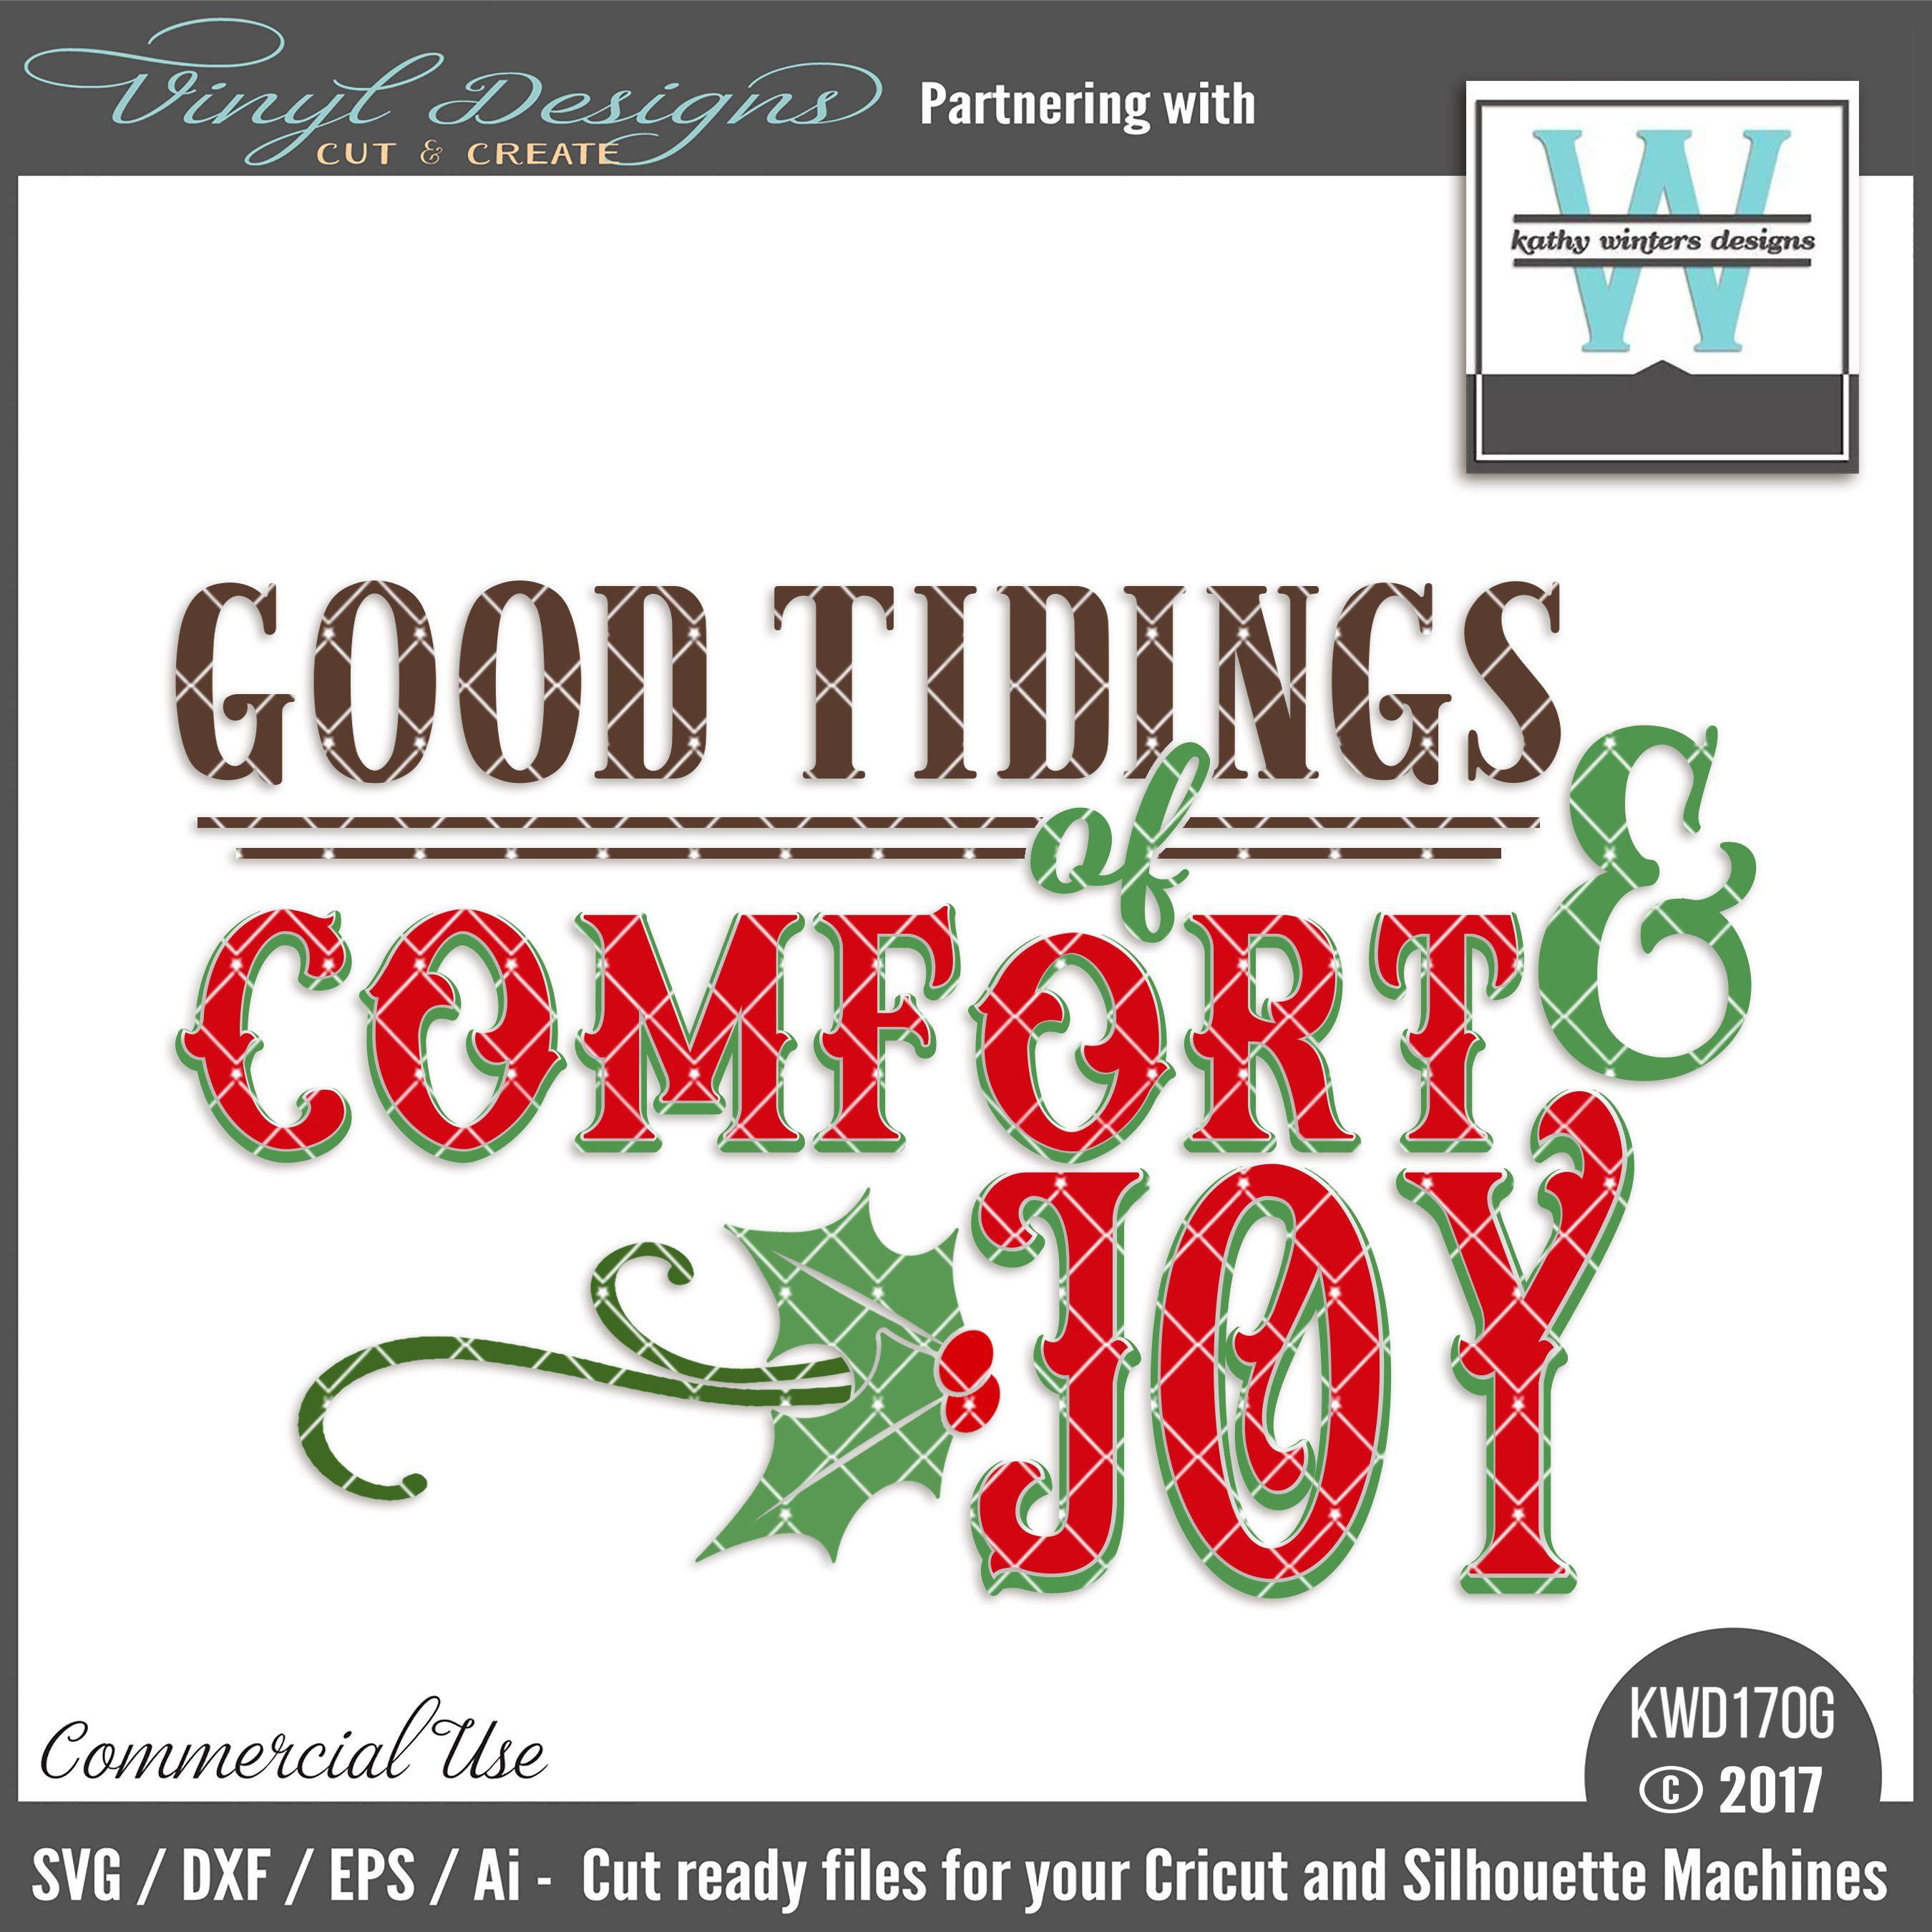 KWD170G Good Tidings Of Comfort & Joy. Sold By Kathy